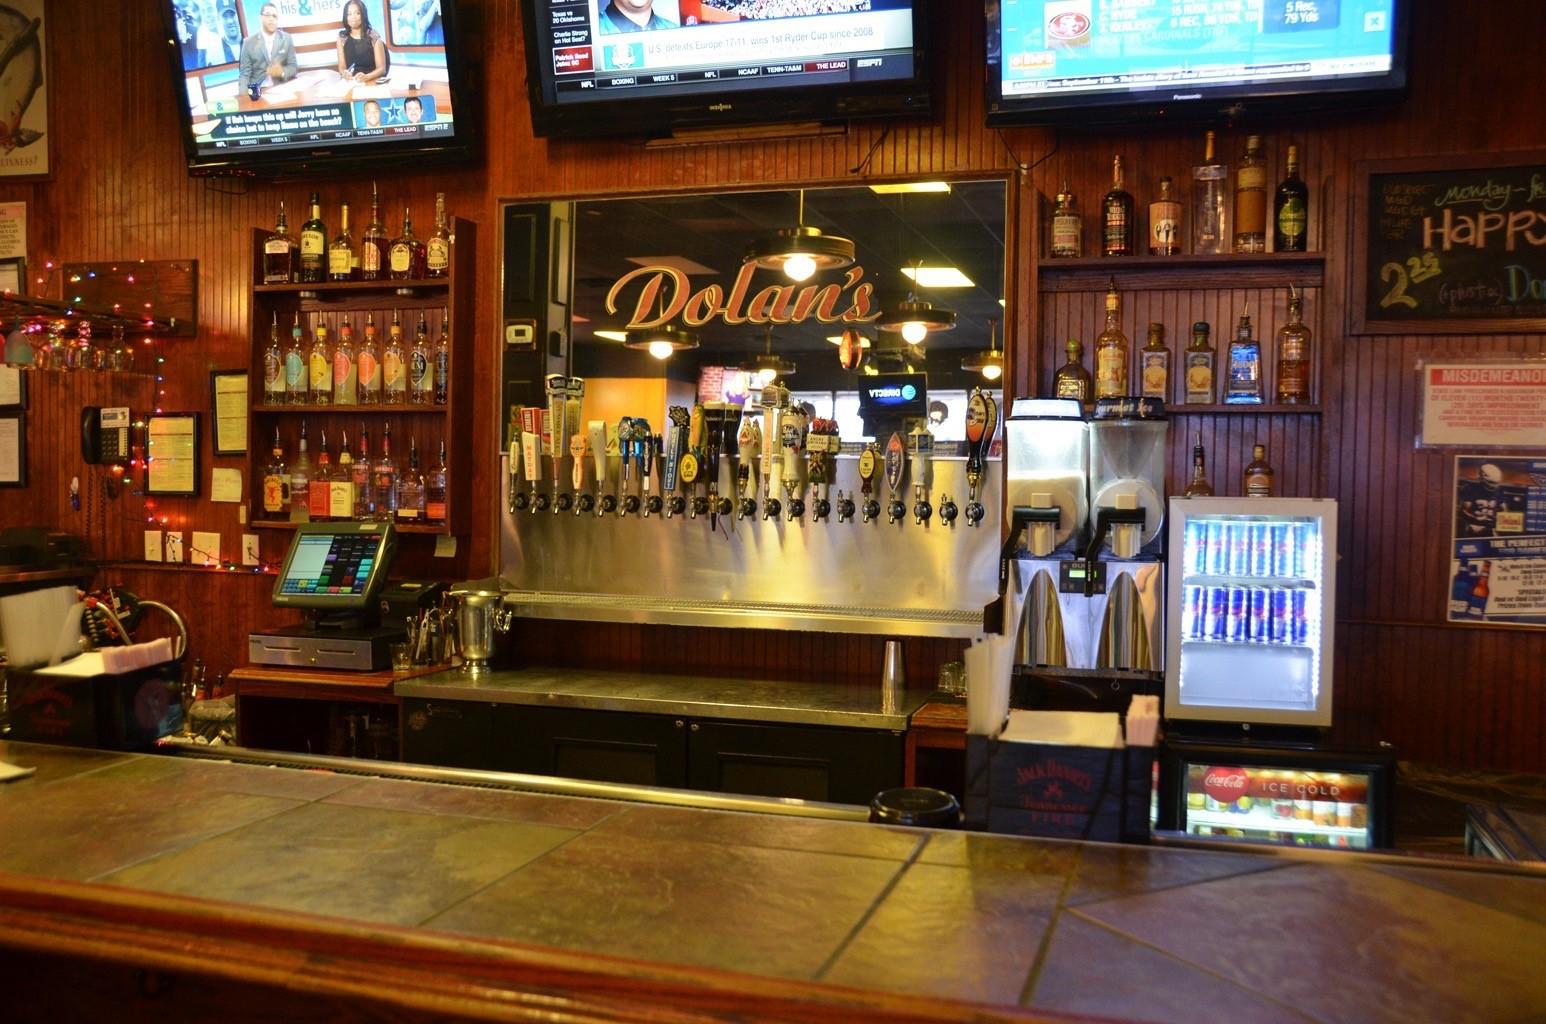 Dolan's Bar & Grill